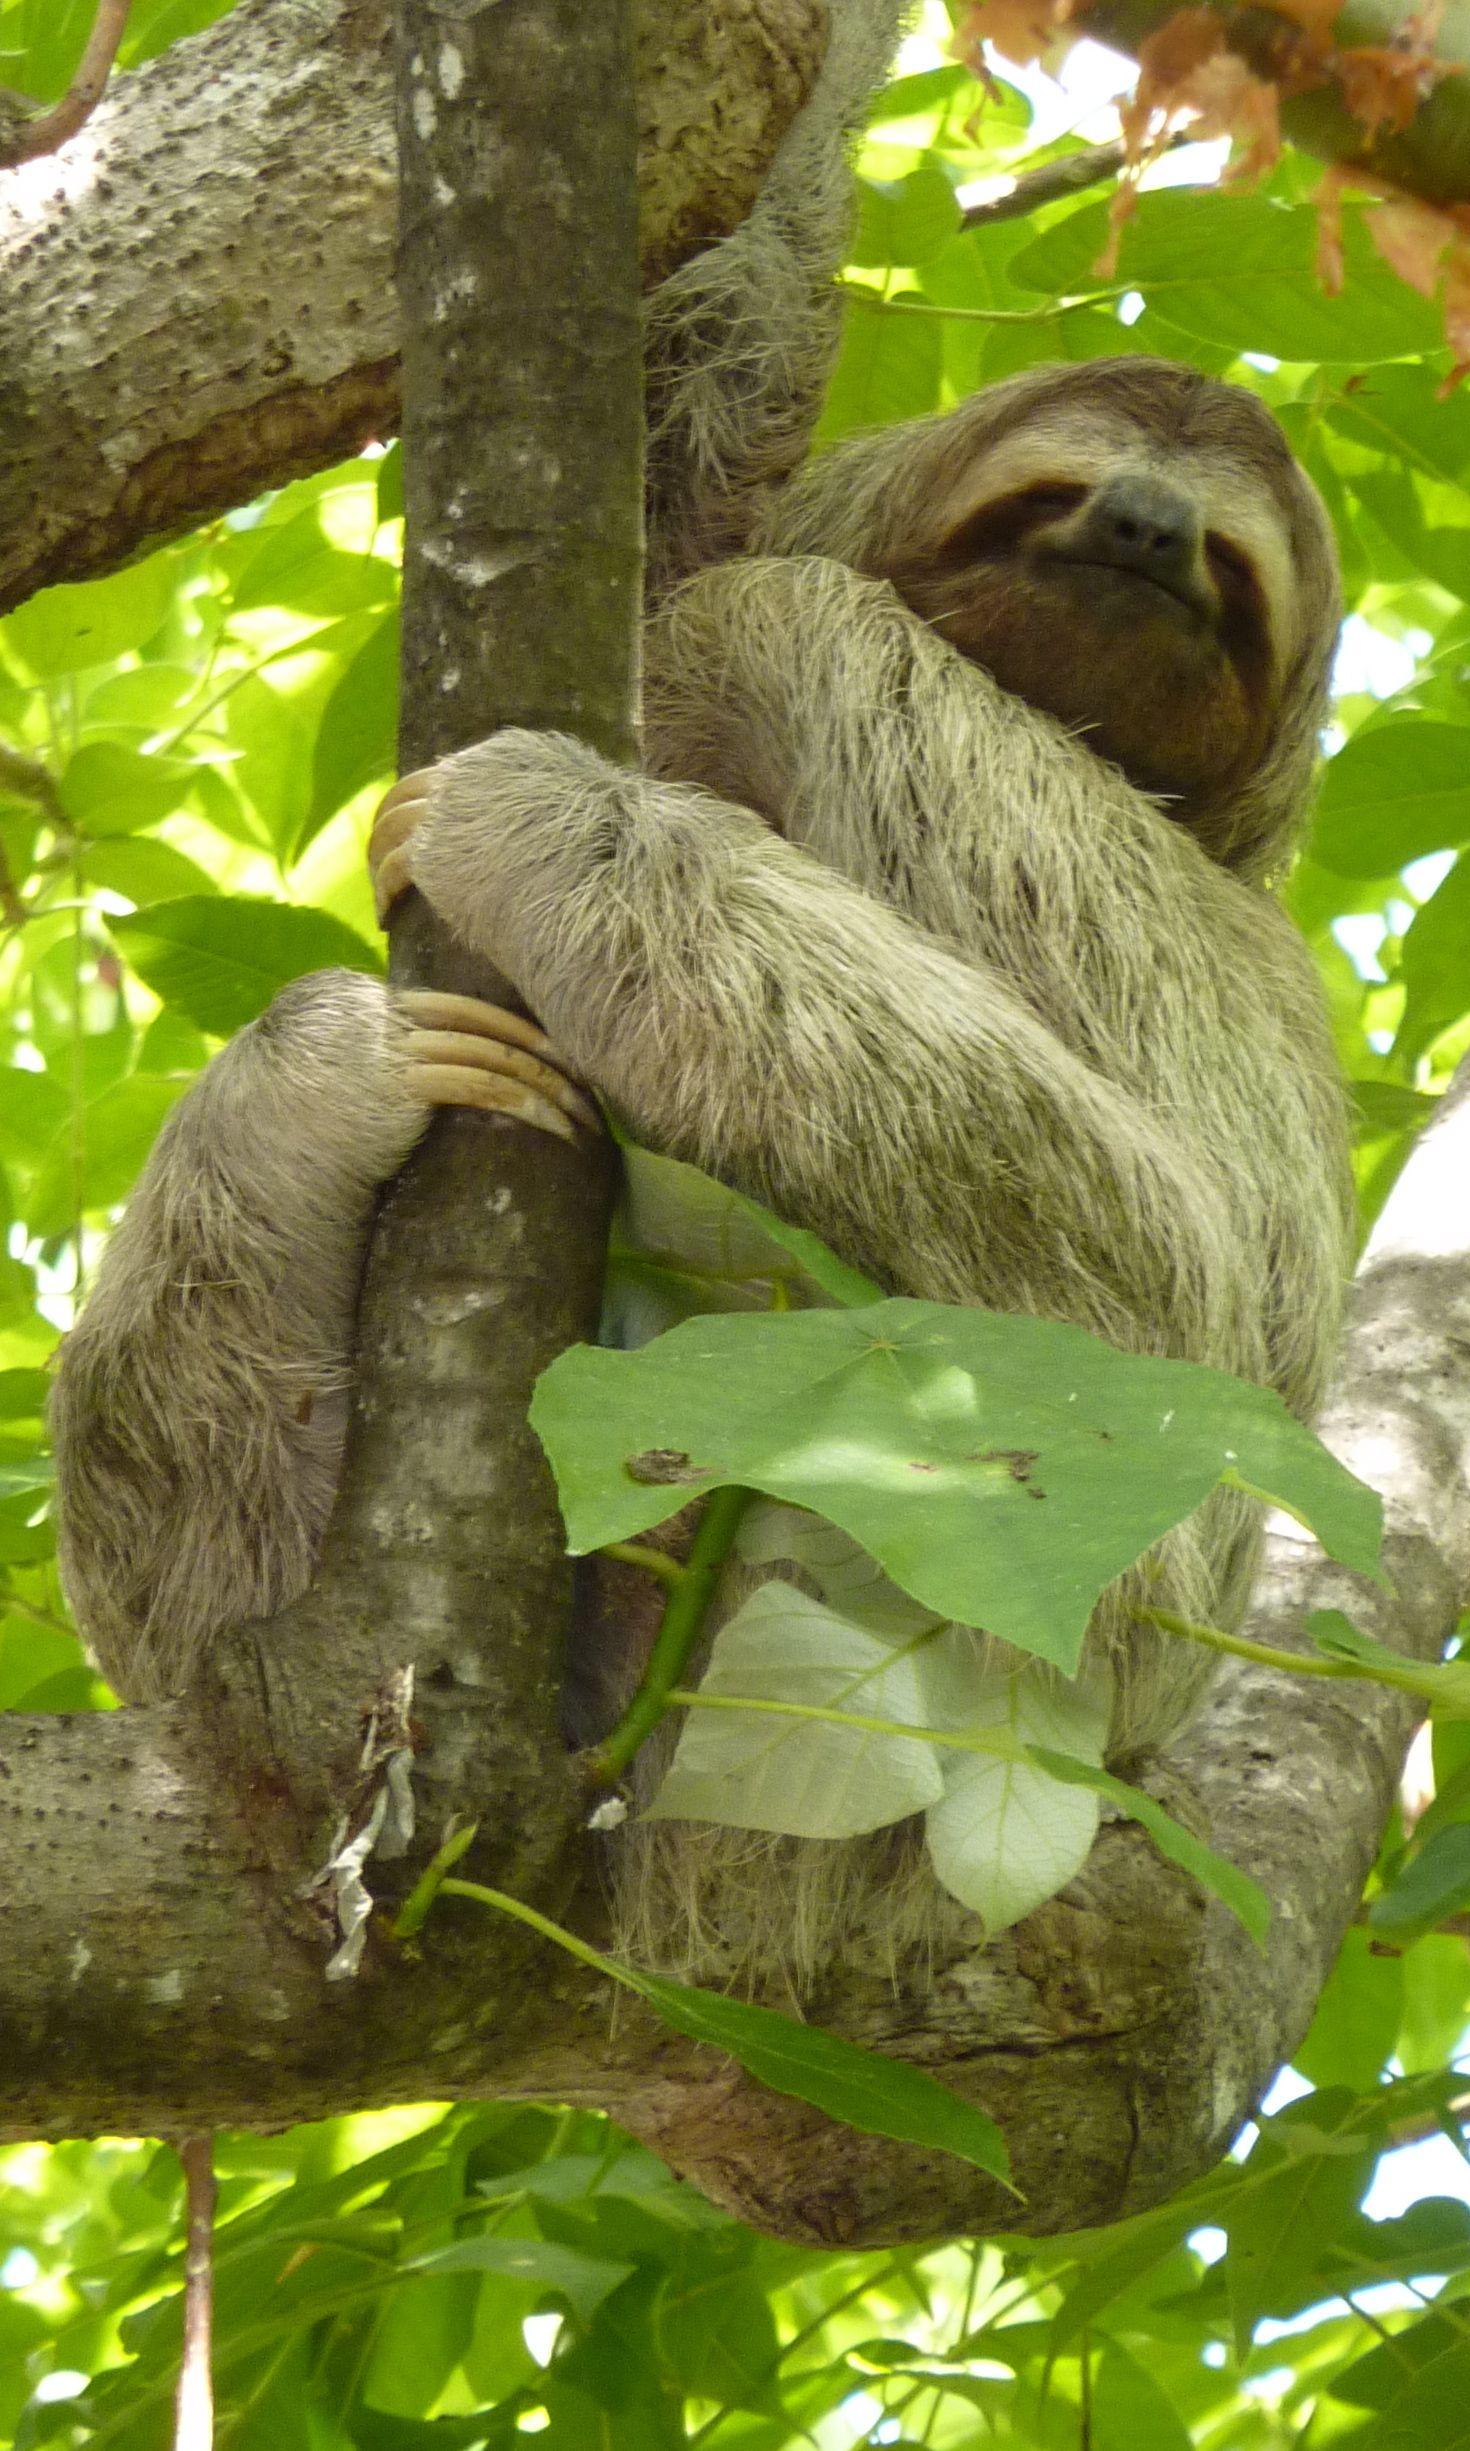 Costa Rica Rainforest Amazon rainforest animals